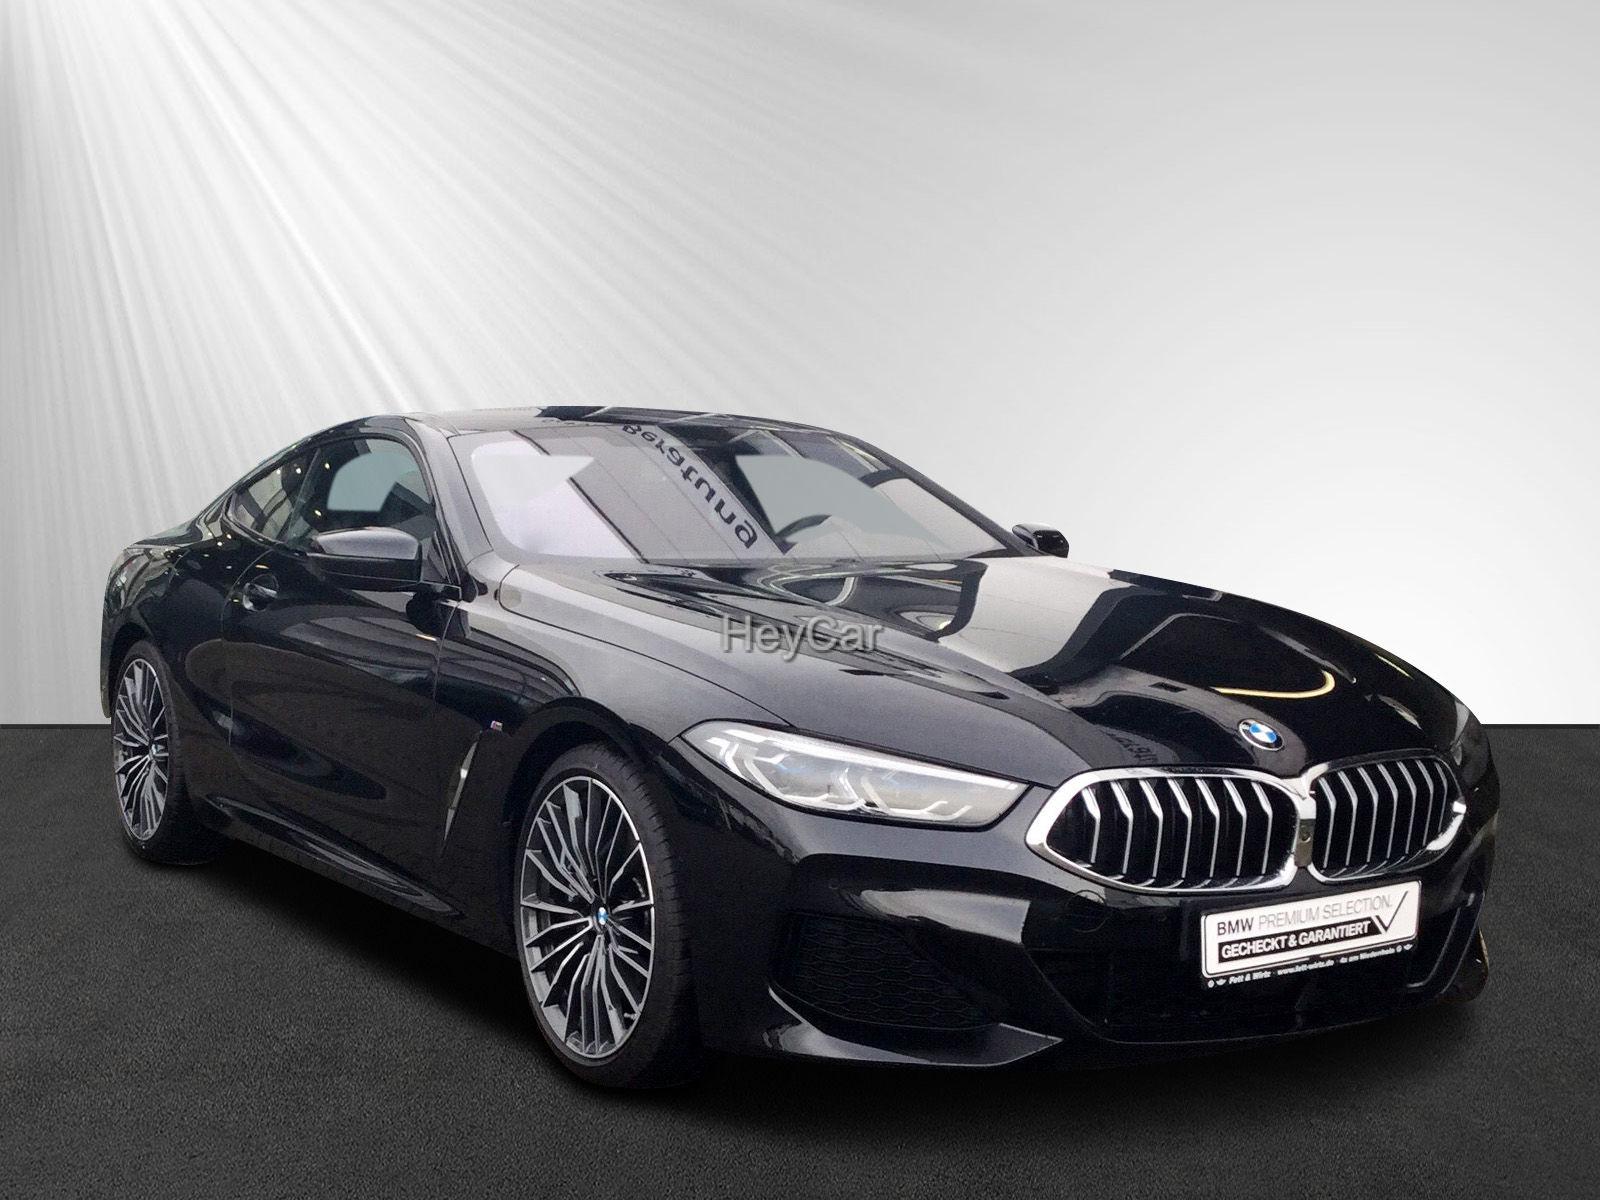 BMW 840d xDrive Coupe M-Sport Leas. ab 799,- br.o.Az, Jahr 2018, Diesel